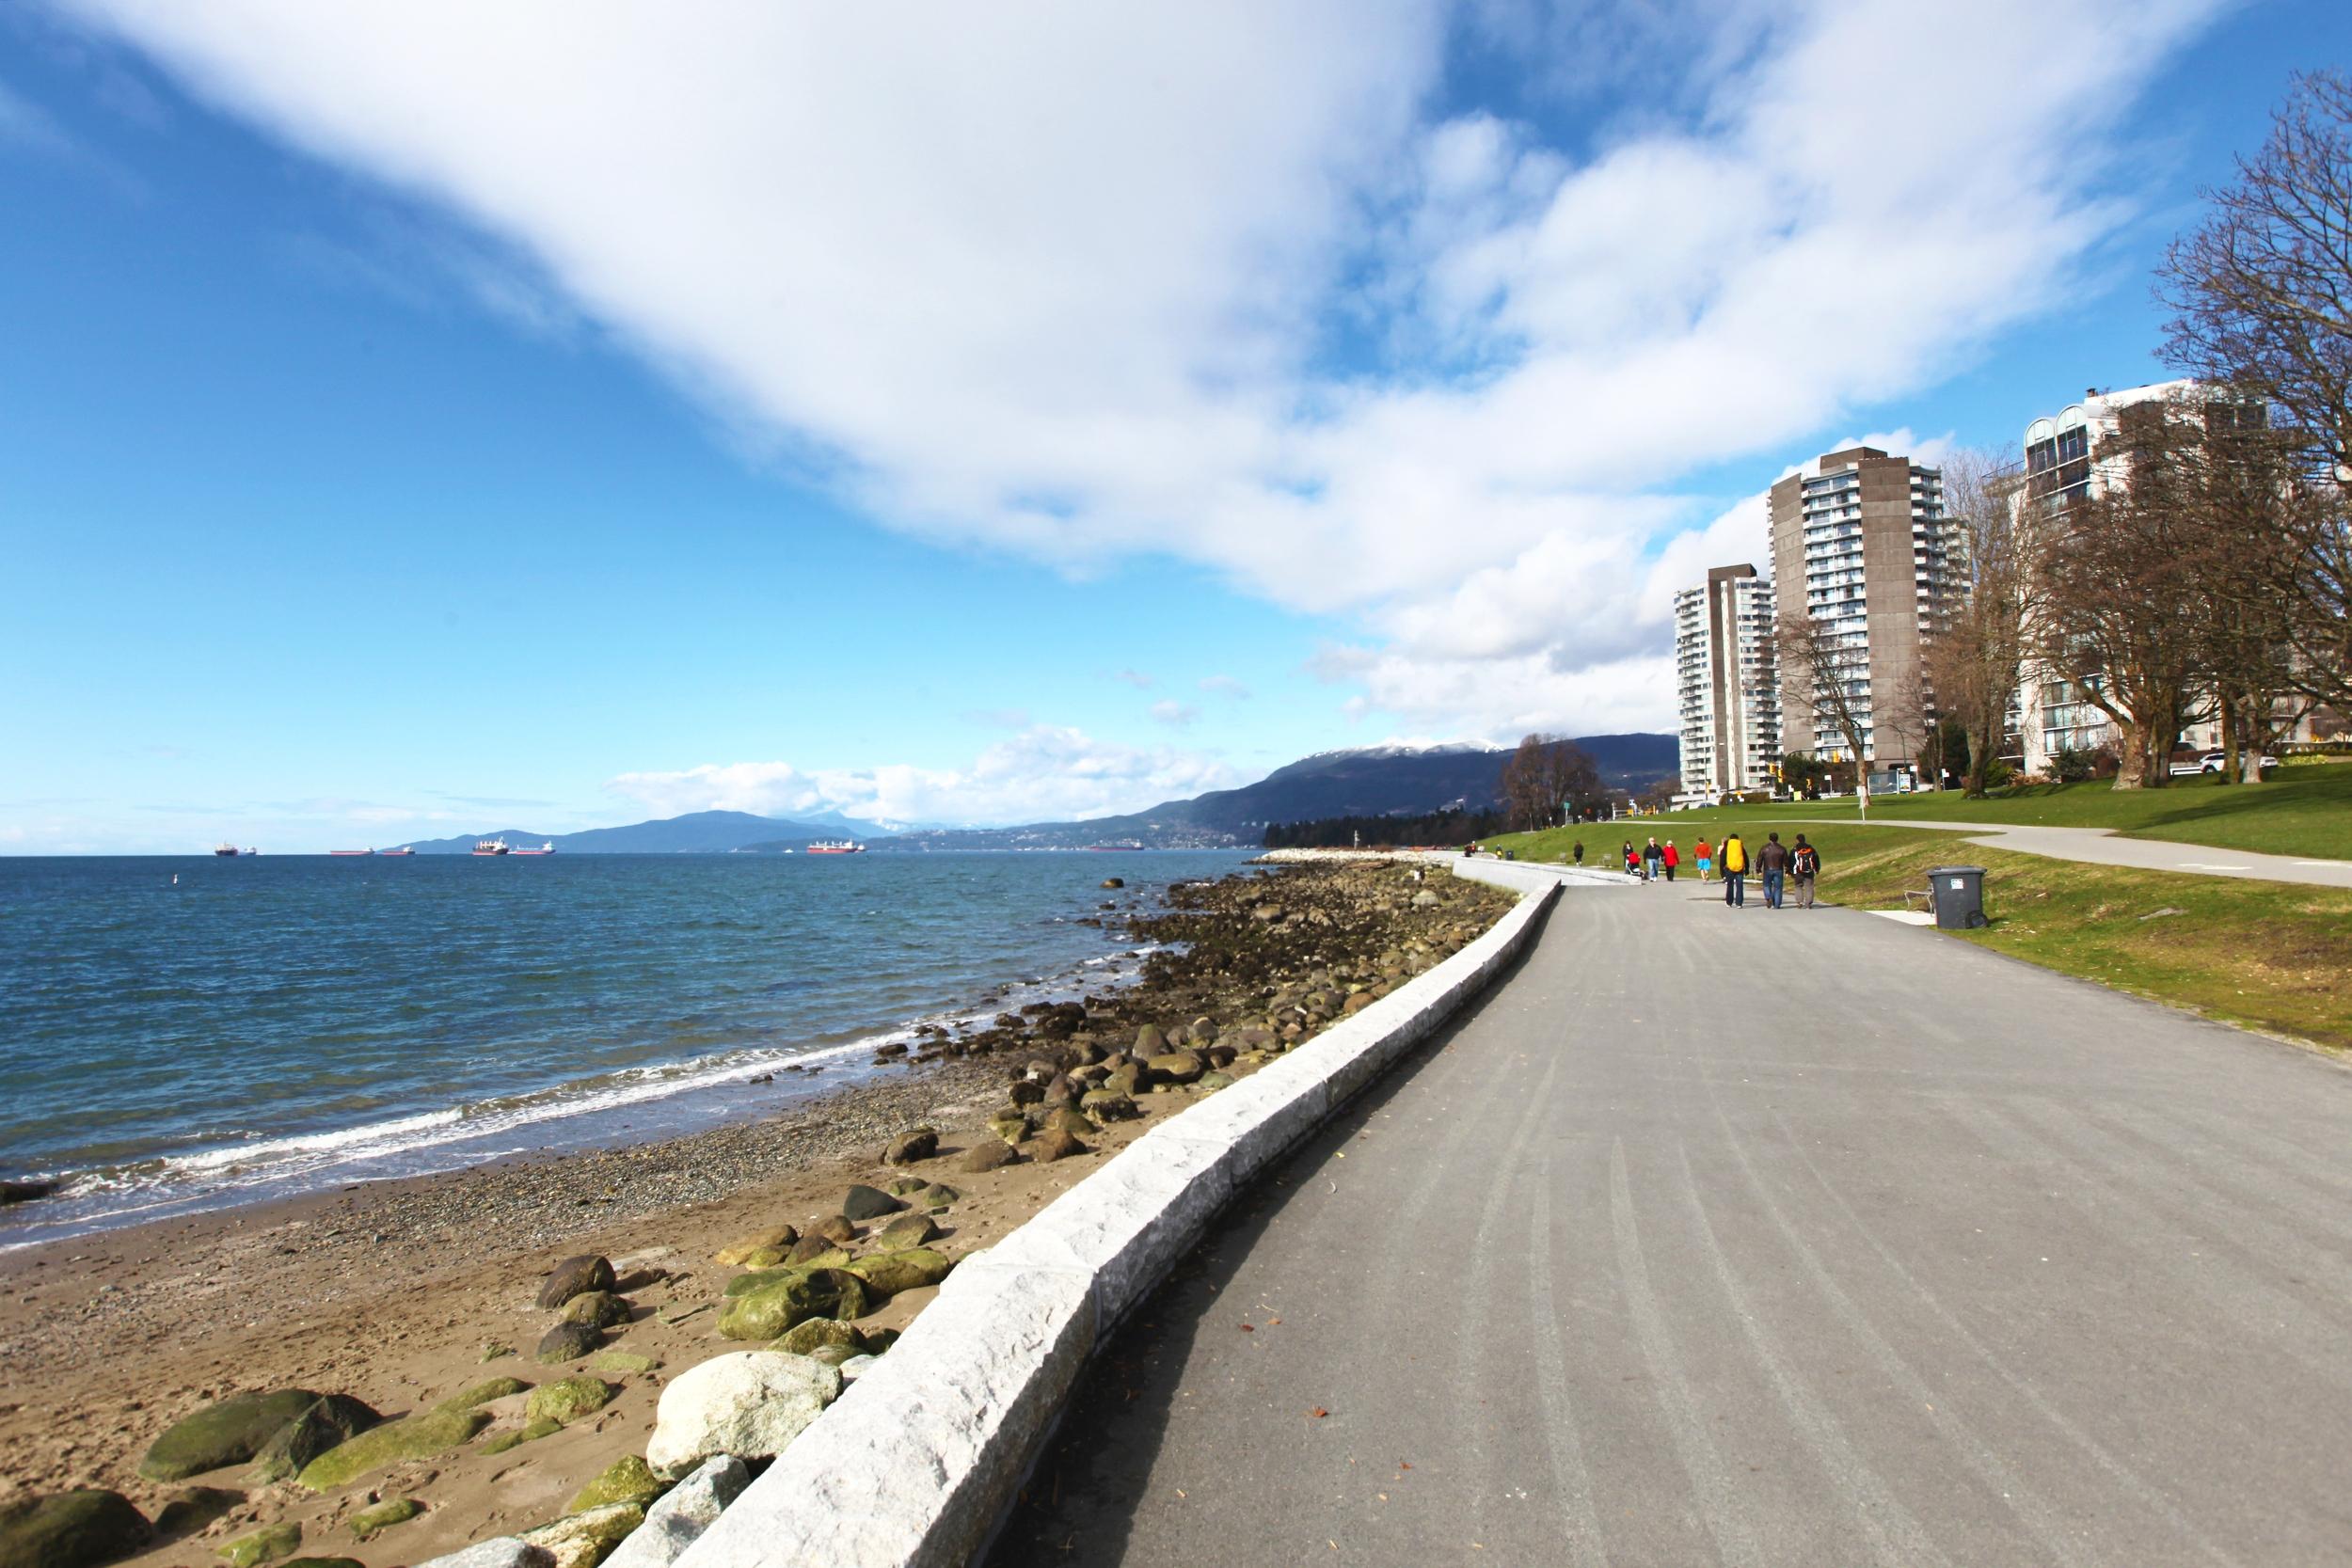 Vancouver Seawall